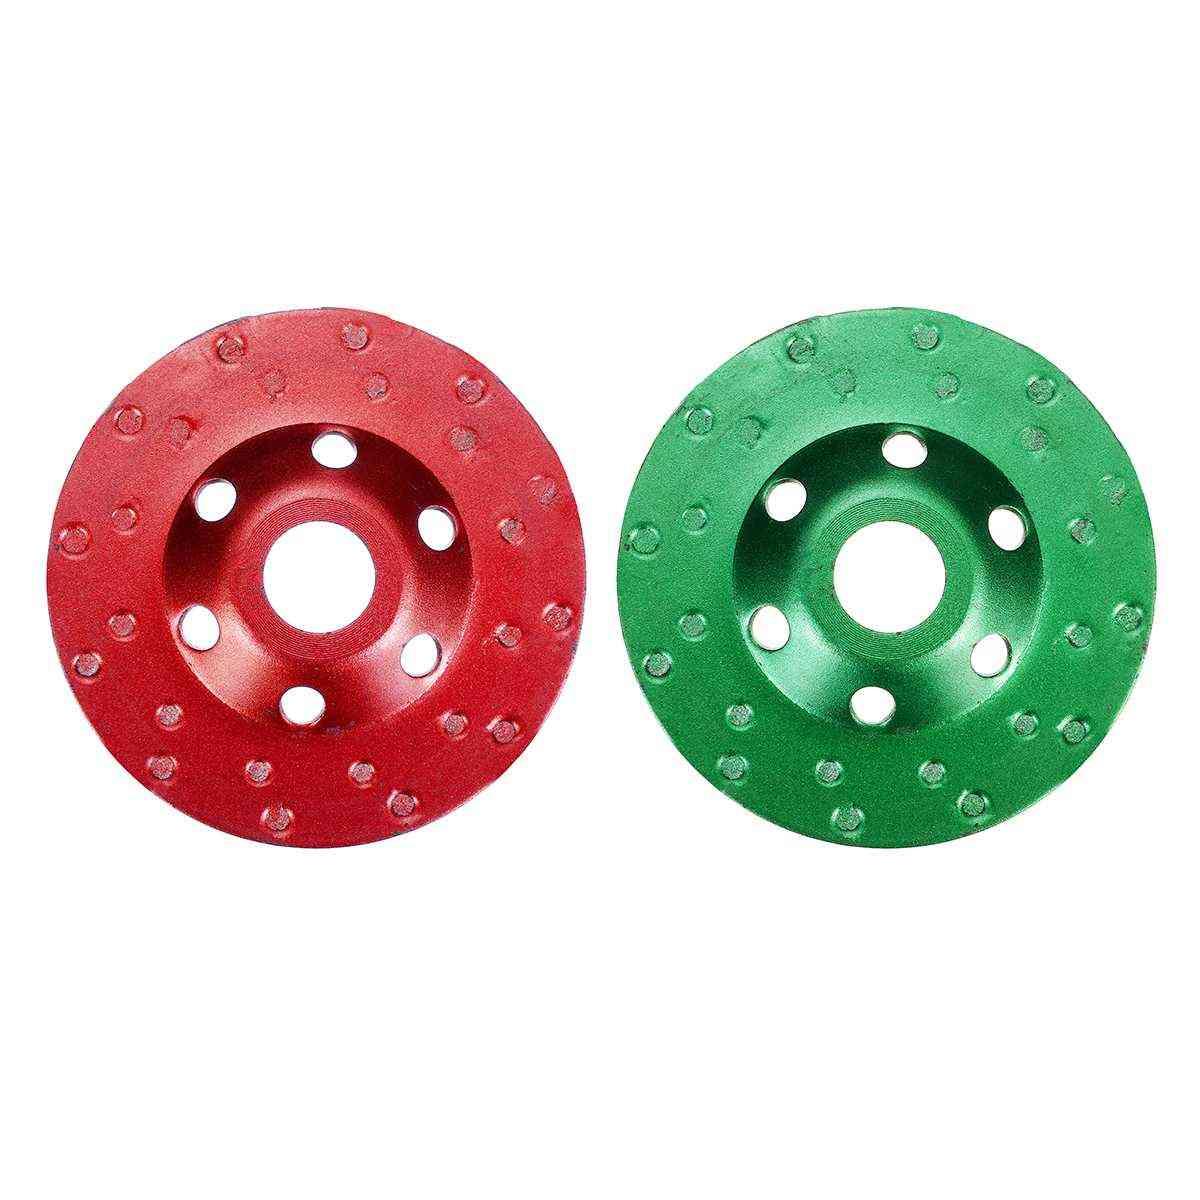 Diamond Grinding Wheel Disc, Bowl Shape For Concrete Granite, Ceramics Tools